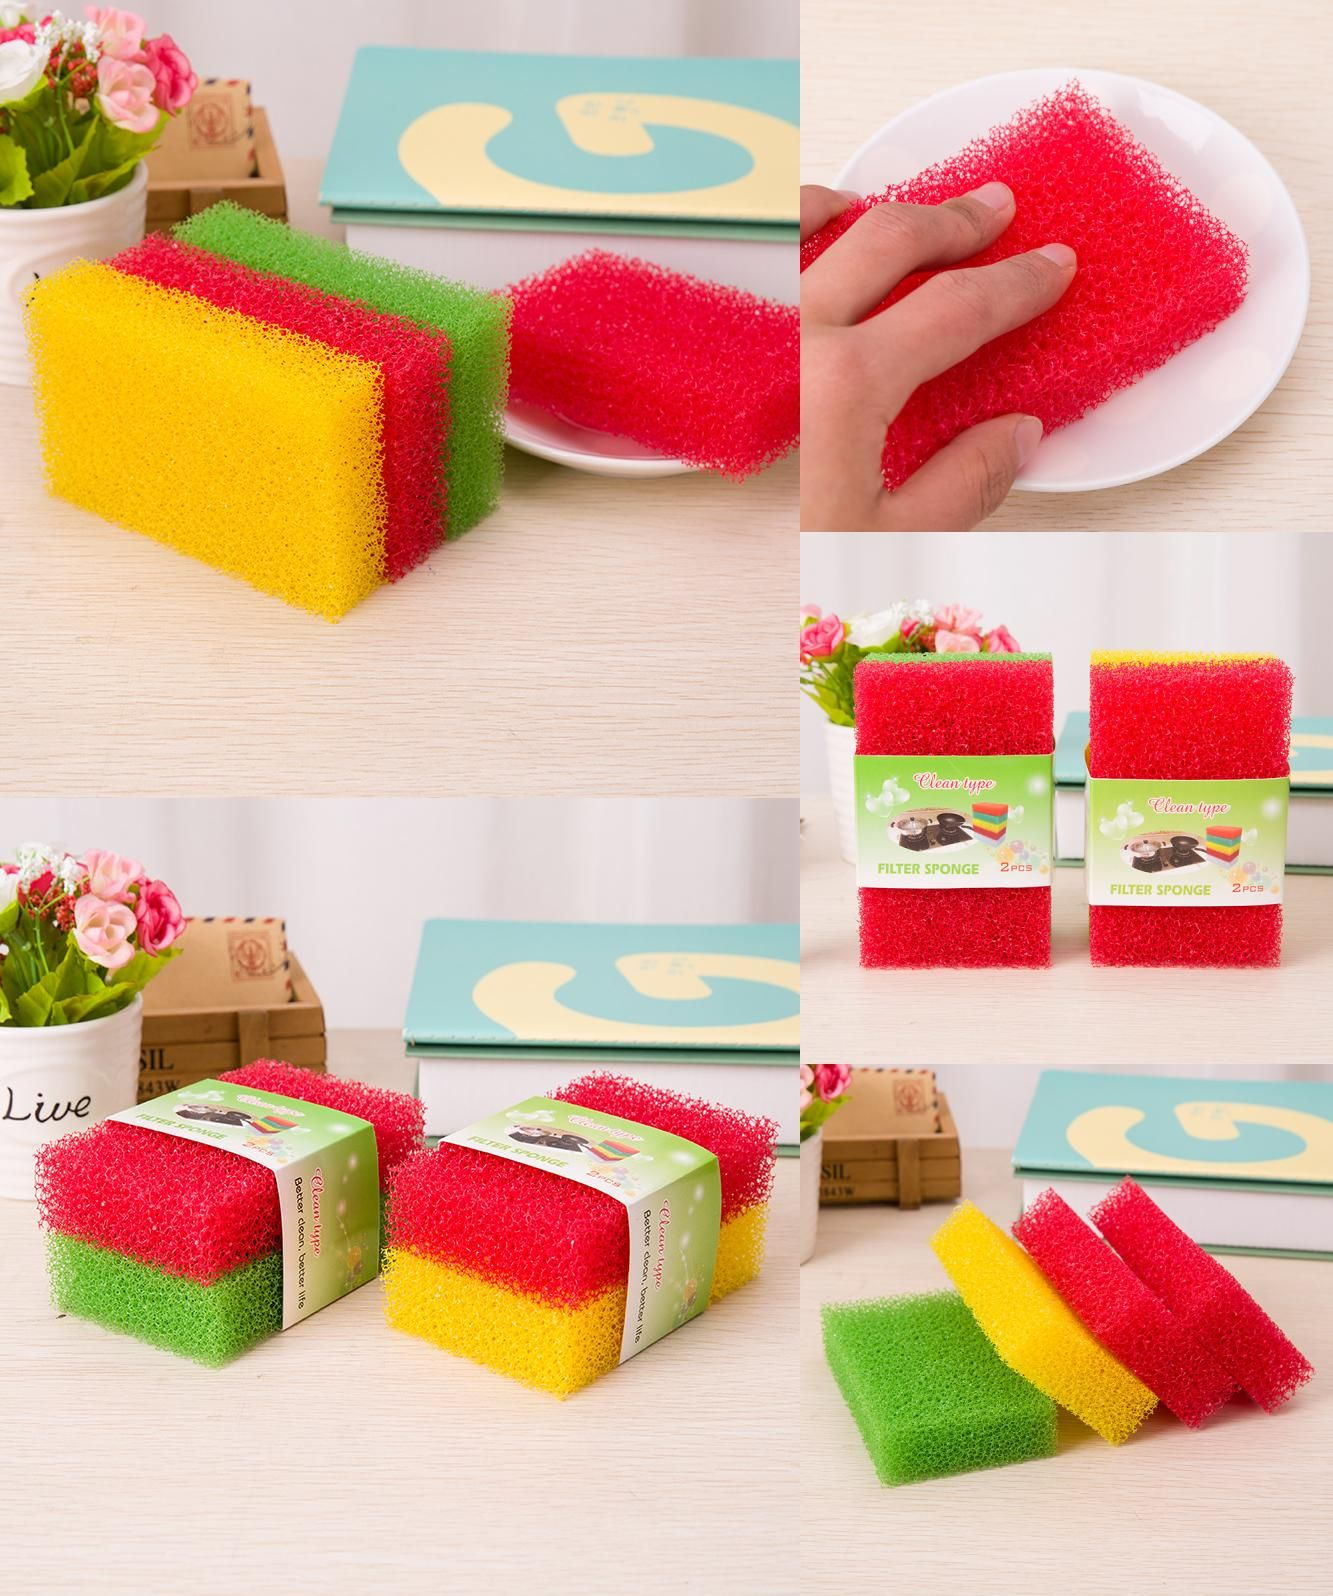 [Visit to Buy] 2Pcs Creative Non Stick Oil Sponge Strong Decontamination Sponge Cloth  Washing Cloth Washing Towel Kitchen items #Advertisement